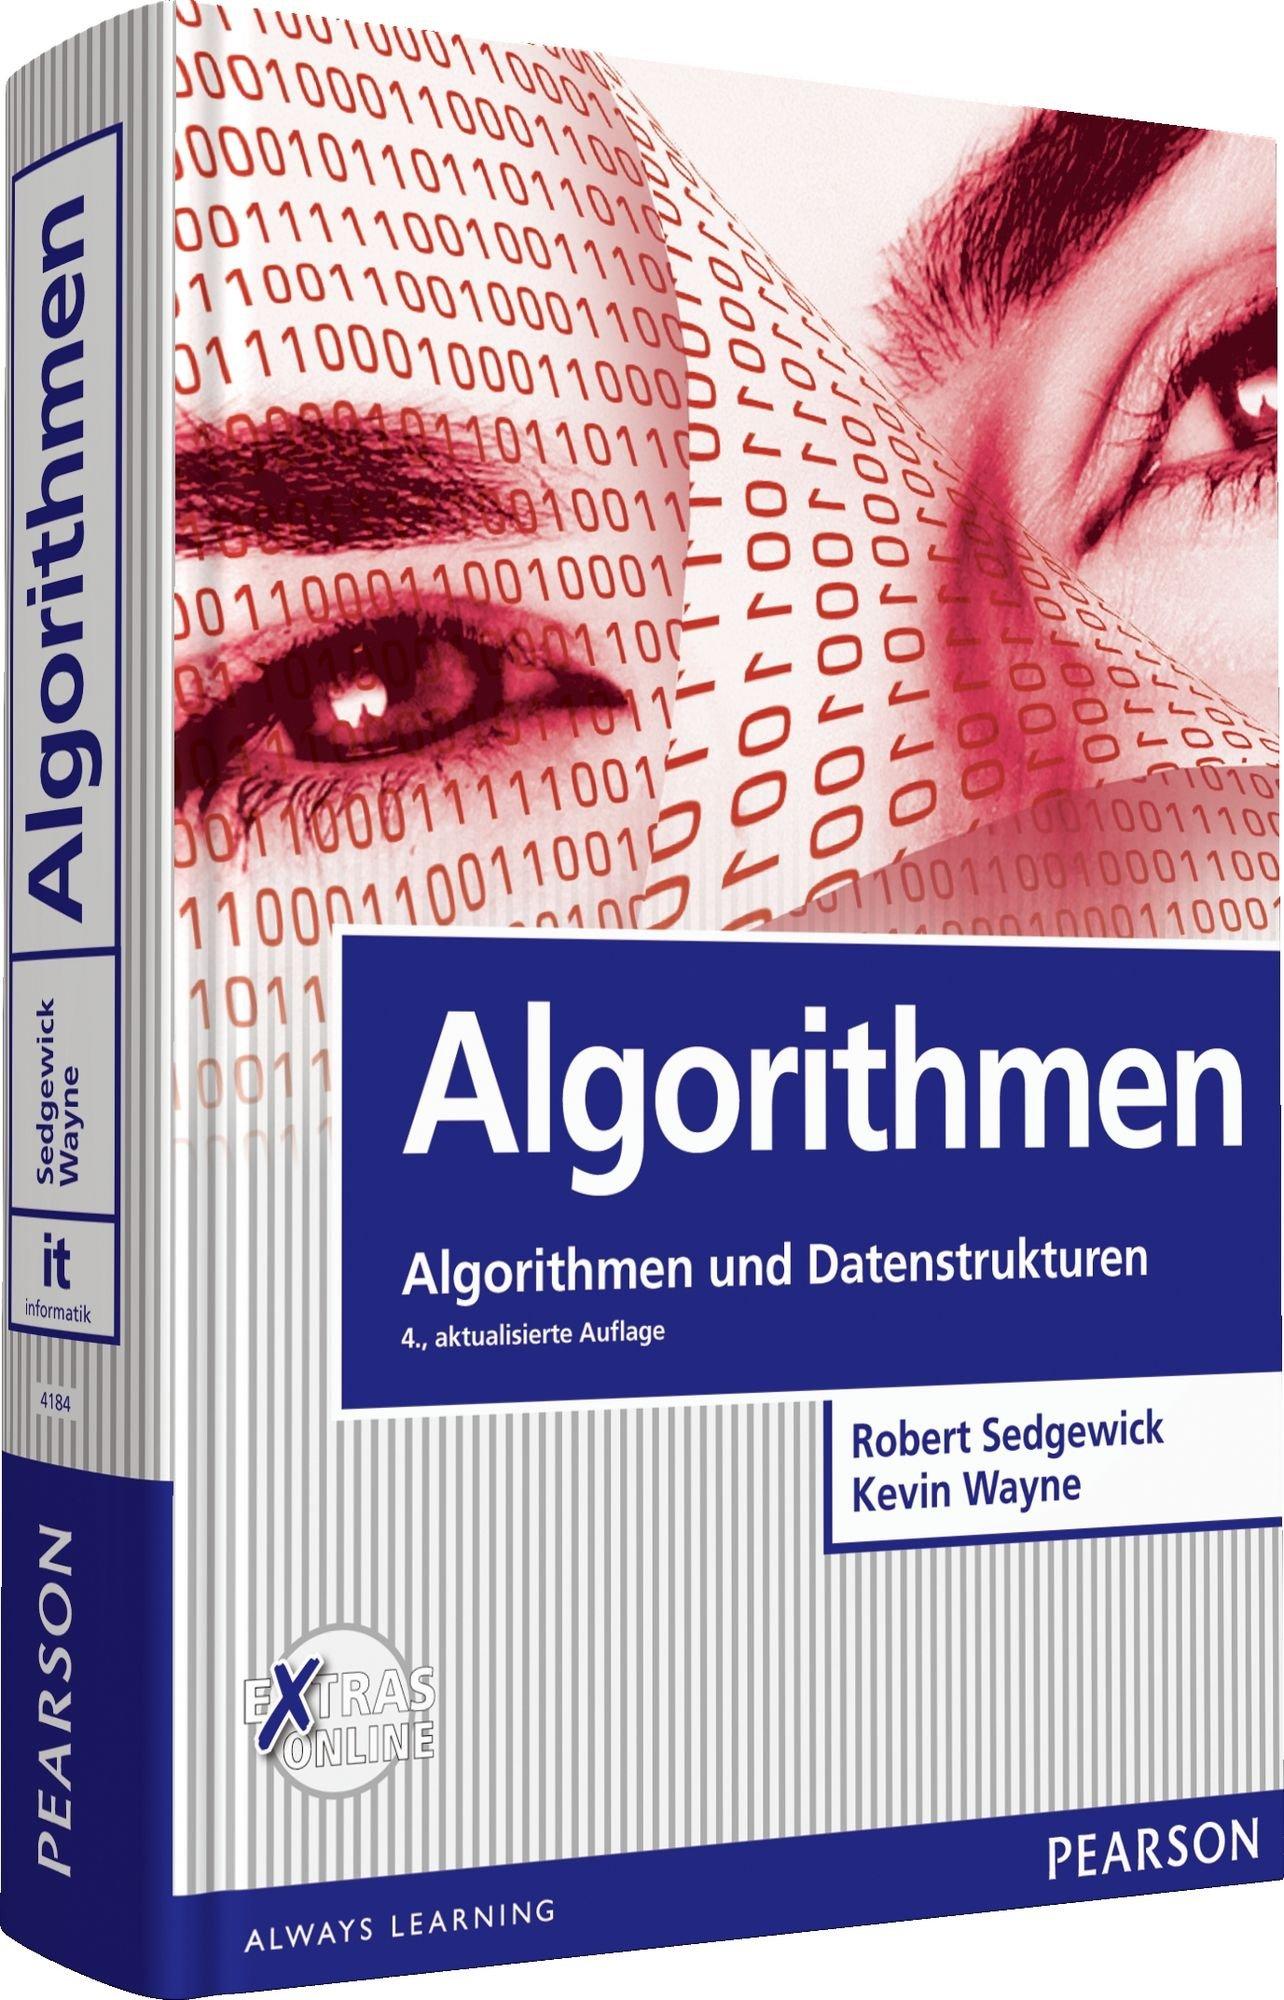 Algorithmen: Algorithmen und Datenstrukturen (Pearson Studium - IT) Taschenbuch – 1. Mai 2014 Robert Sedgewick Kevin Wayne 3868941843 Informatik